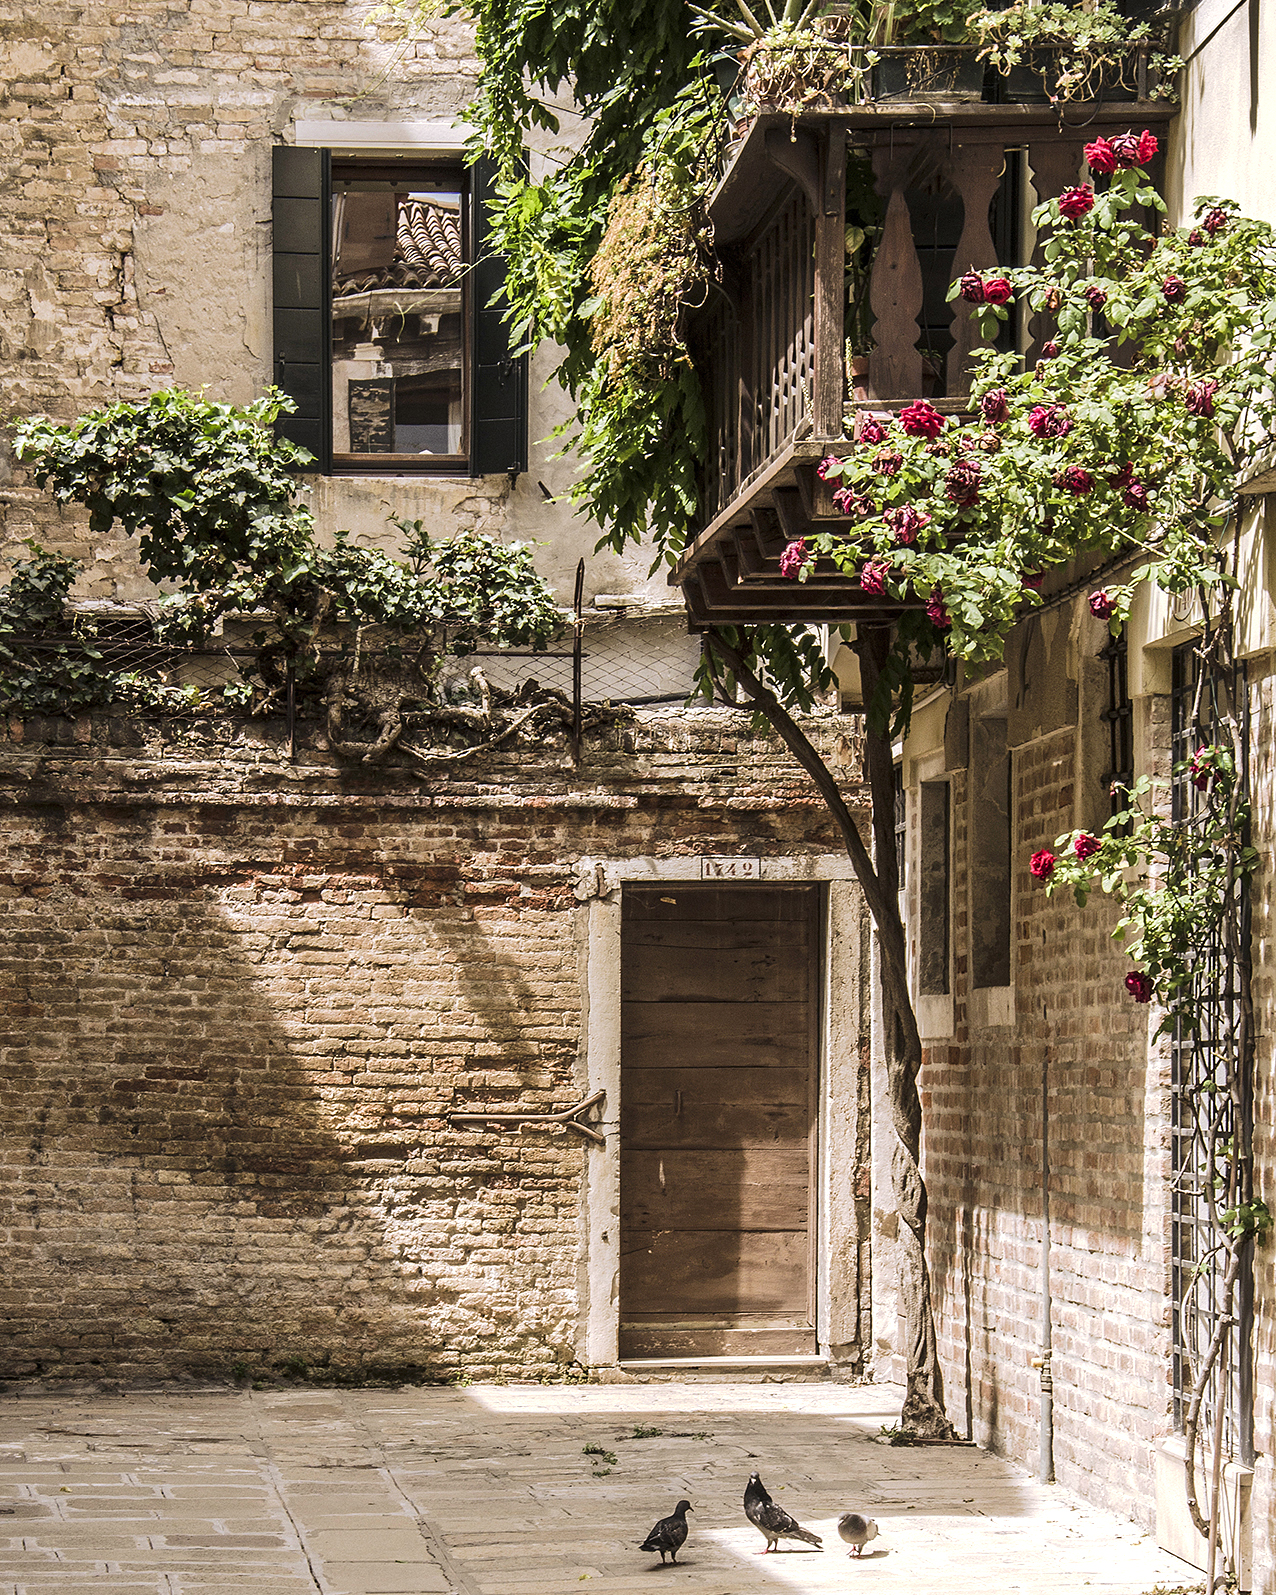 angolo veneziano-7842.jpg